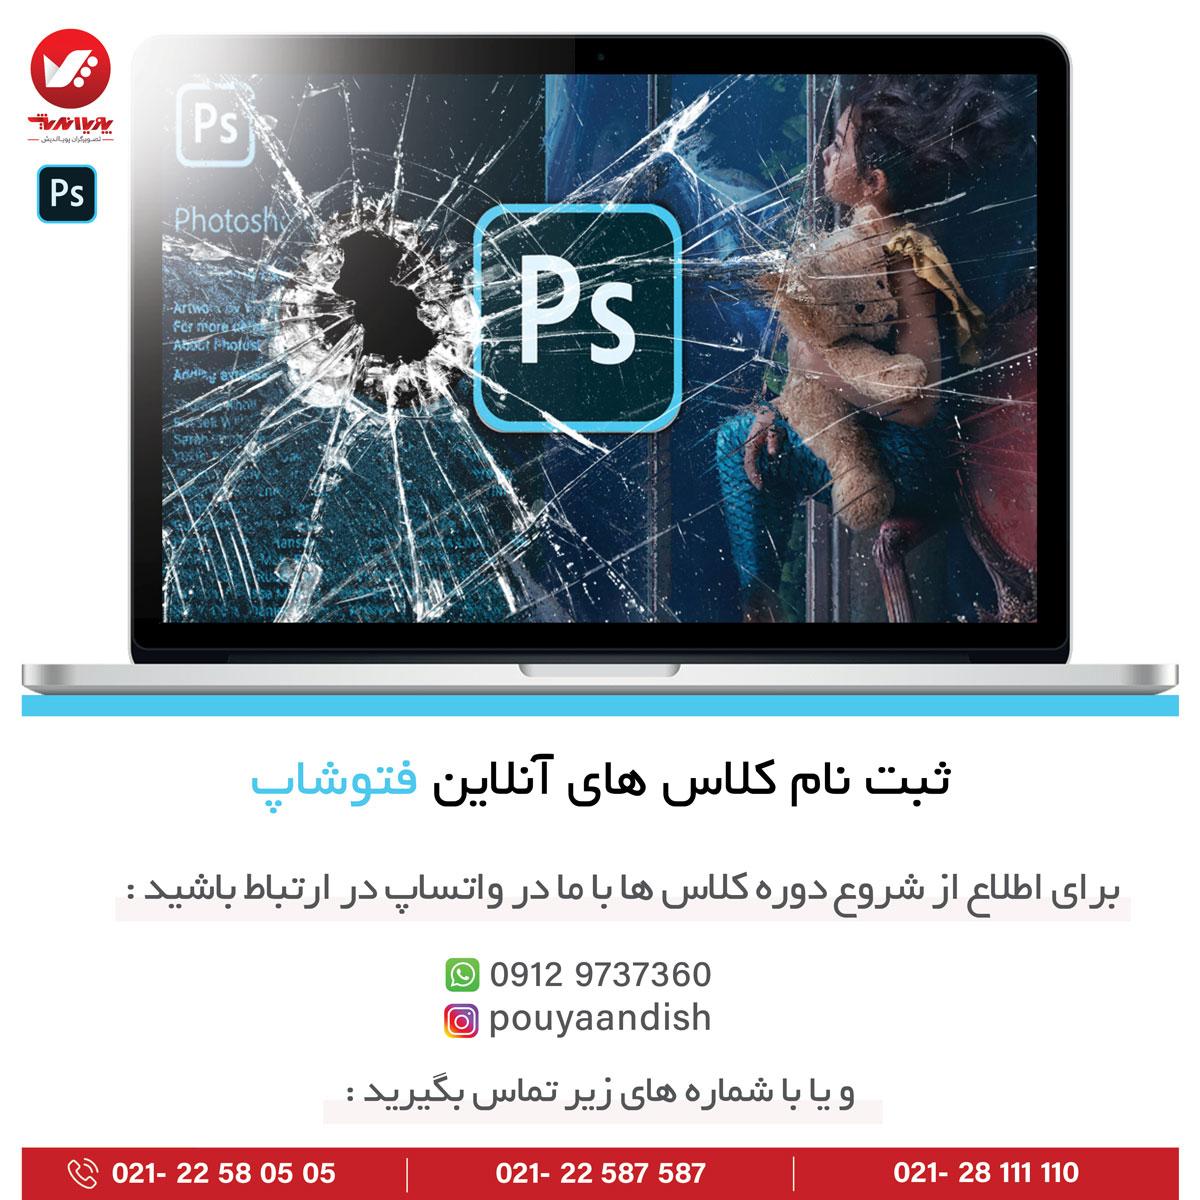 photoshop insta - آموزش فتوشاپ